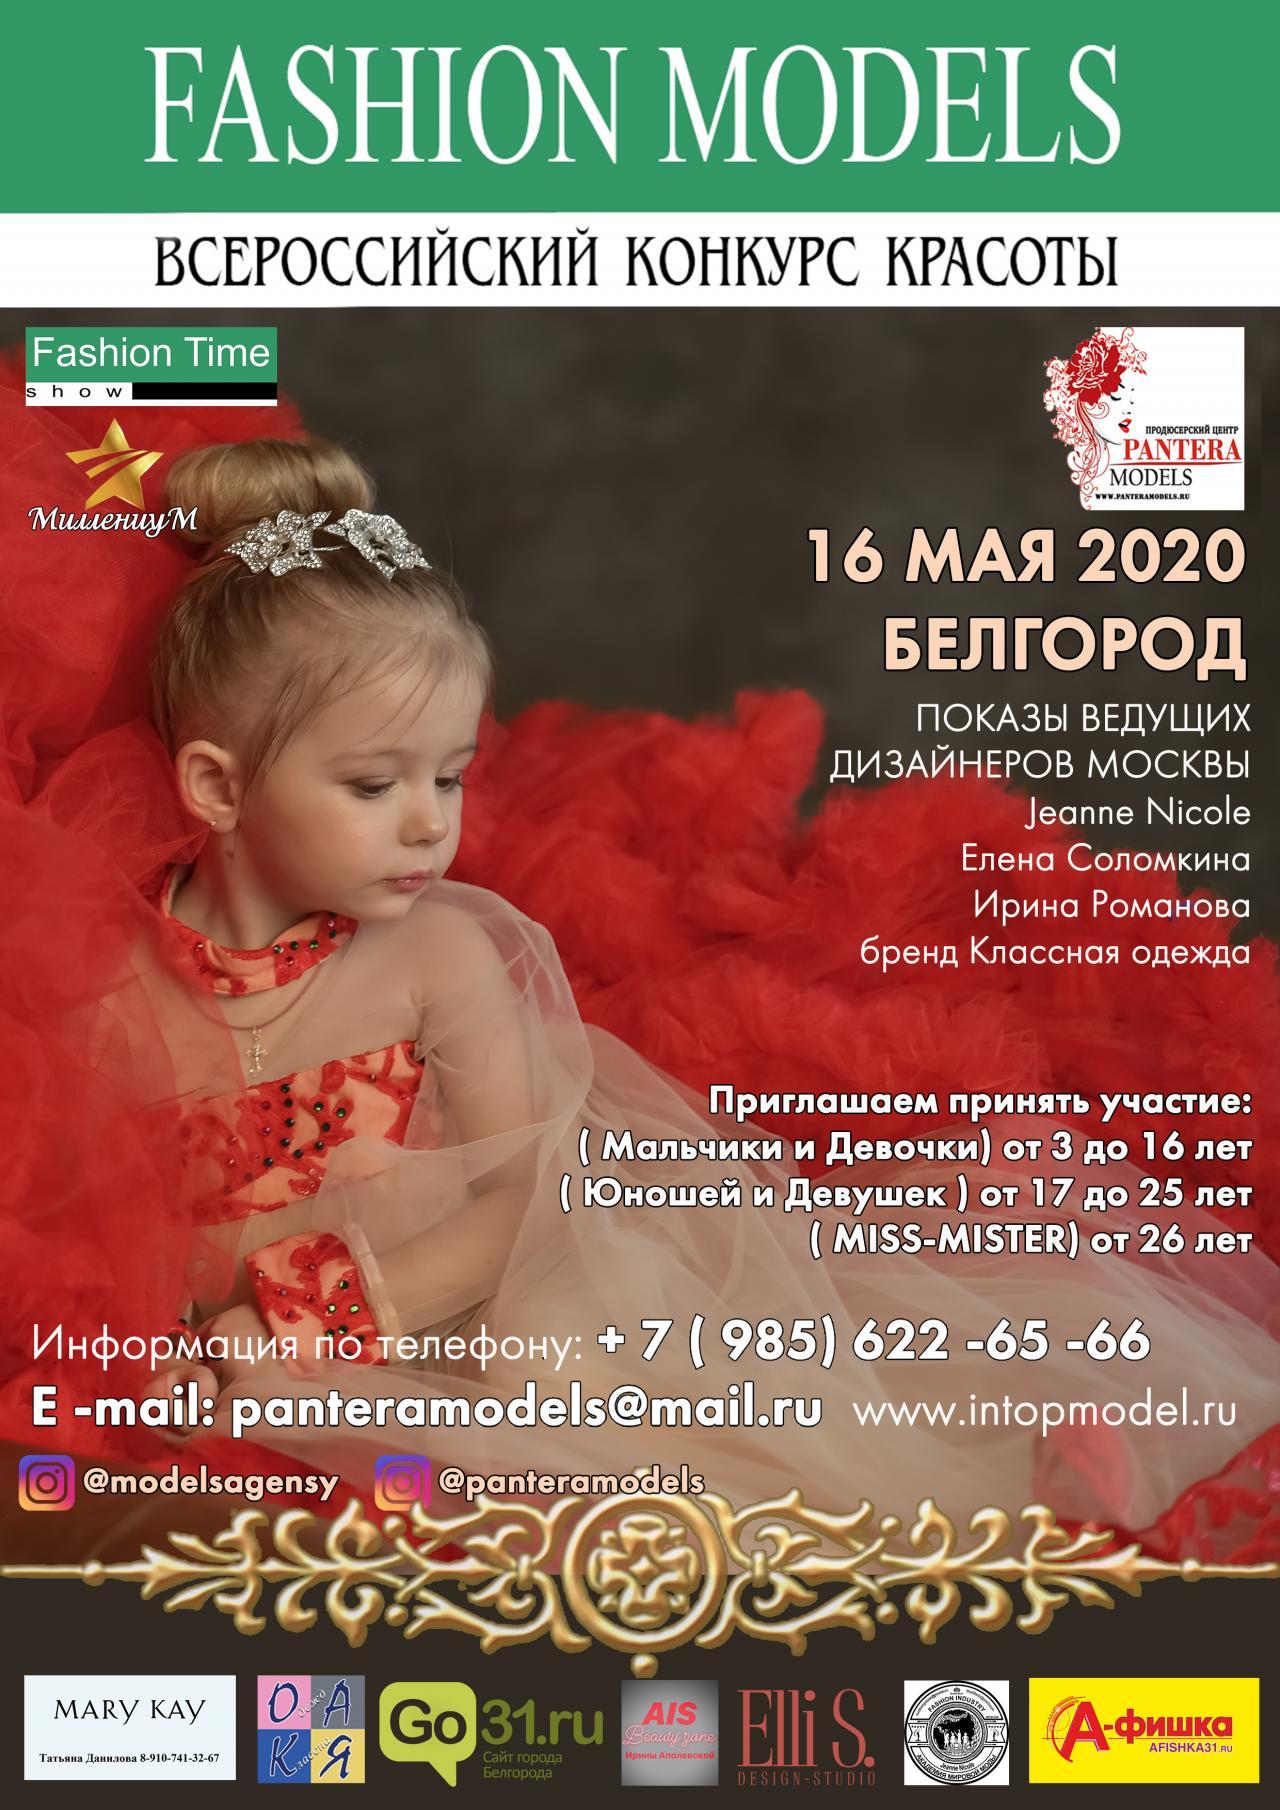 FASHION MODELS-2020  КОНКУРС КРАСОТЫ